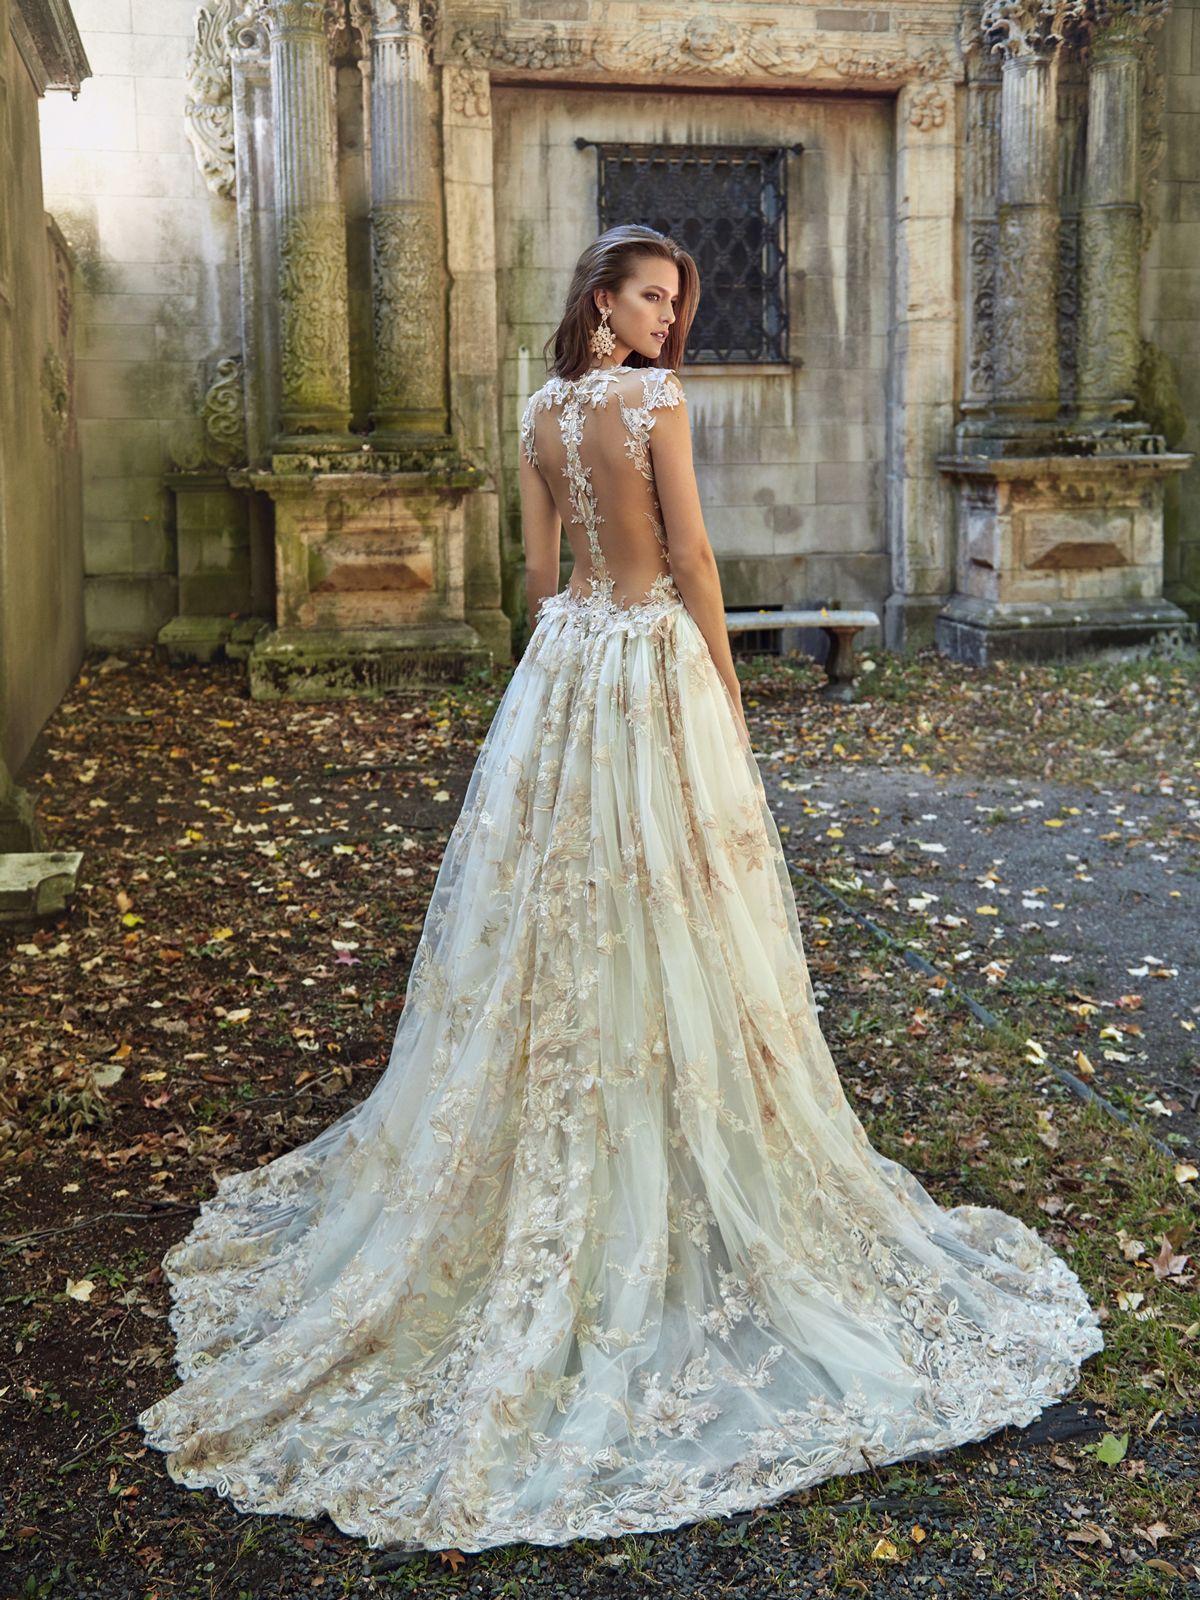 b7481f3c33a3 Galia Lahav - lily-rose - Princess silhouette in a multi-layered sheer dress